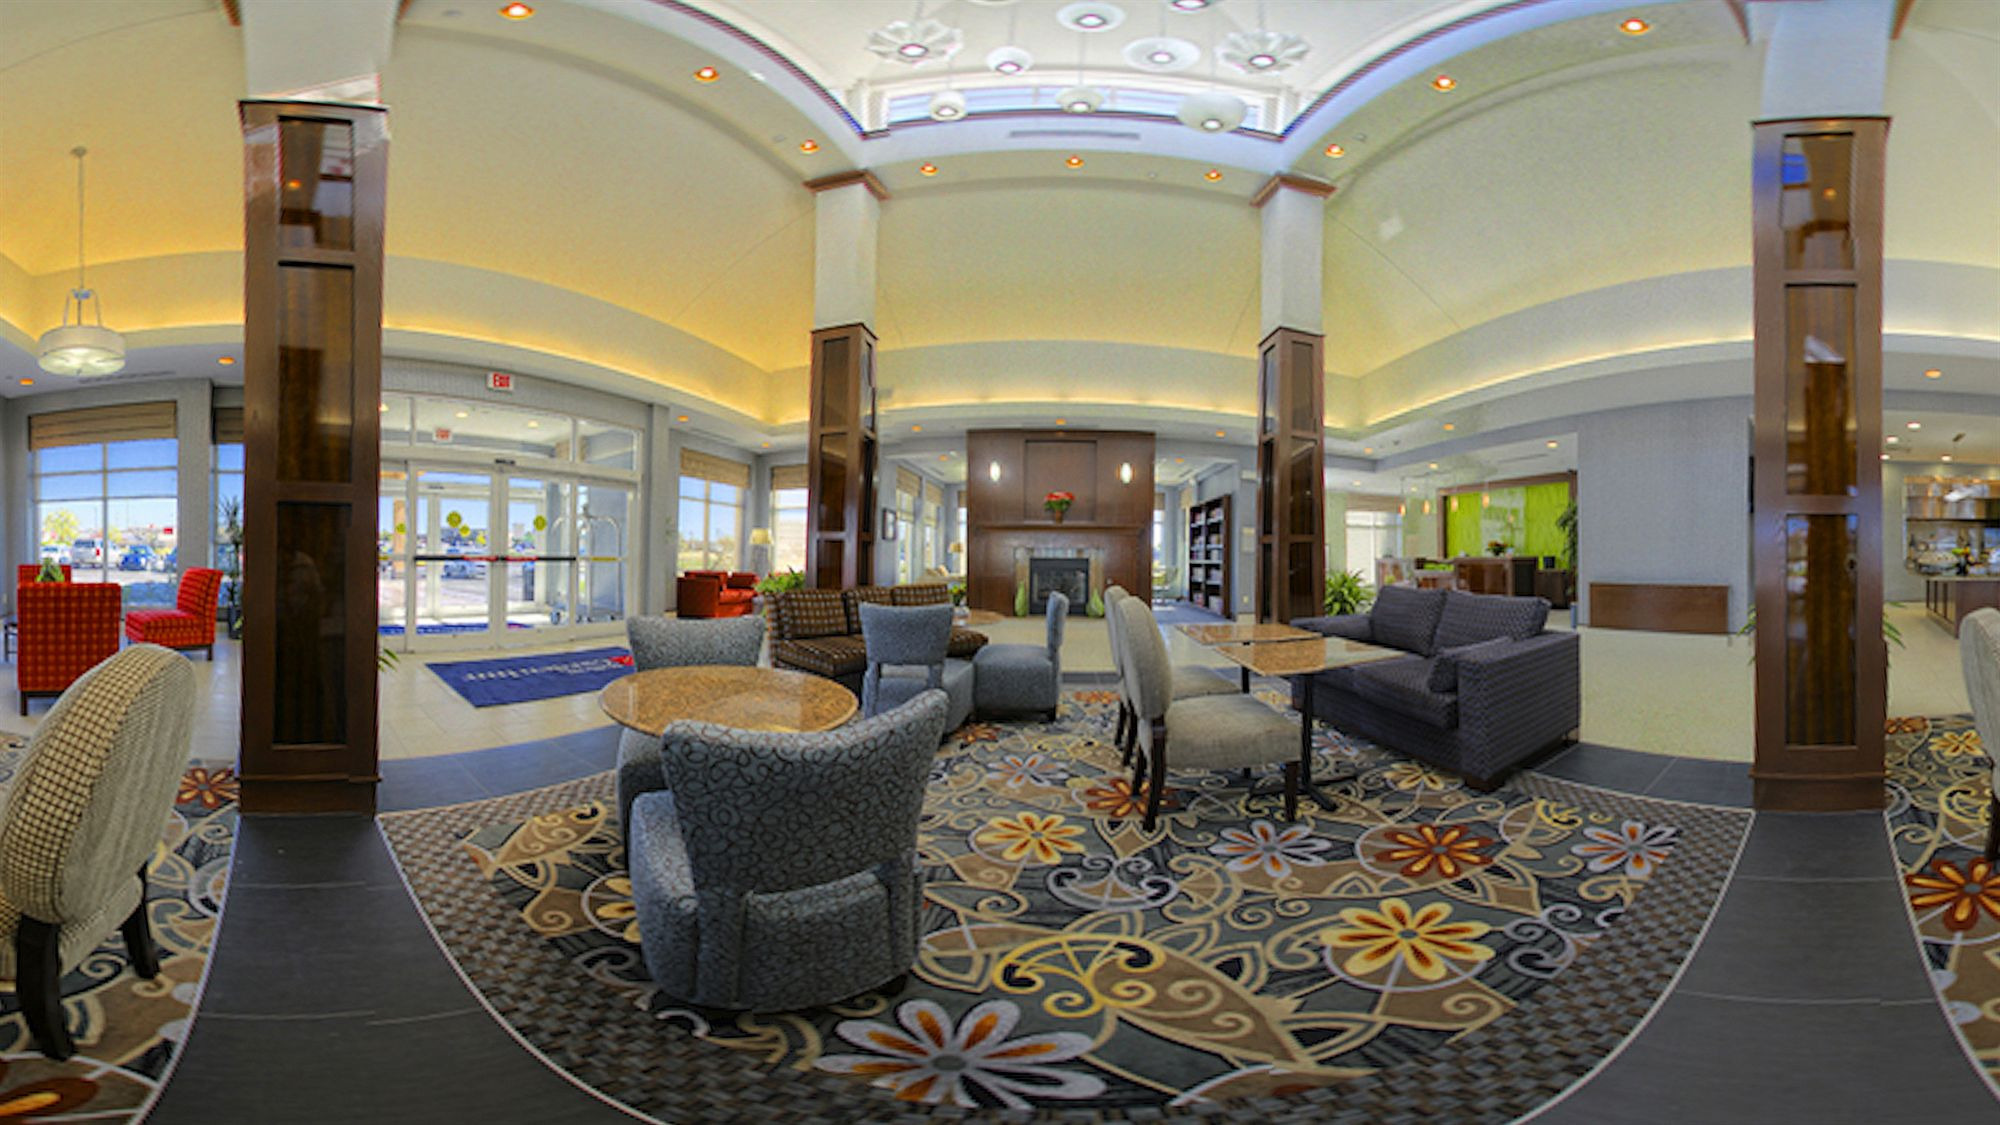 Tulsa Hotel Coupons For Tulsa Oklahoma Freehotelcoupons Com